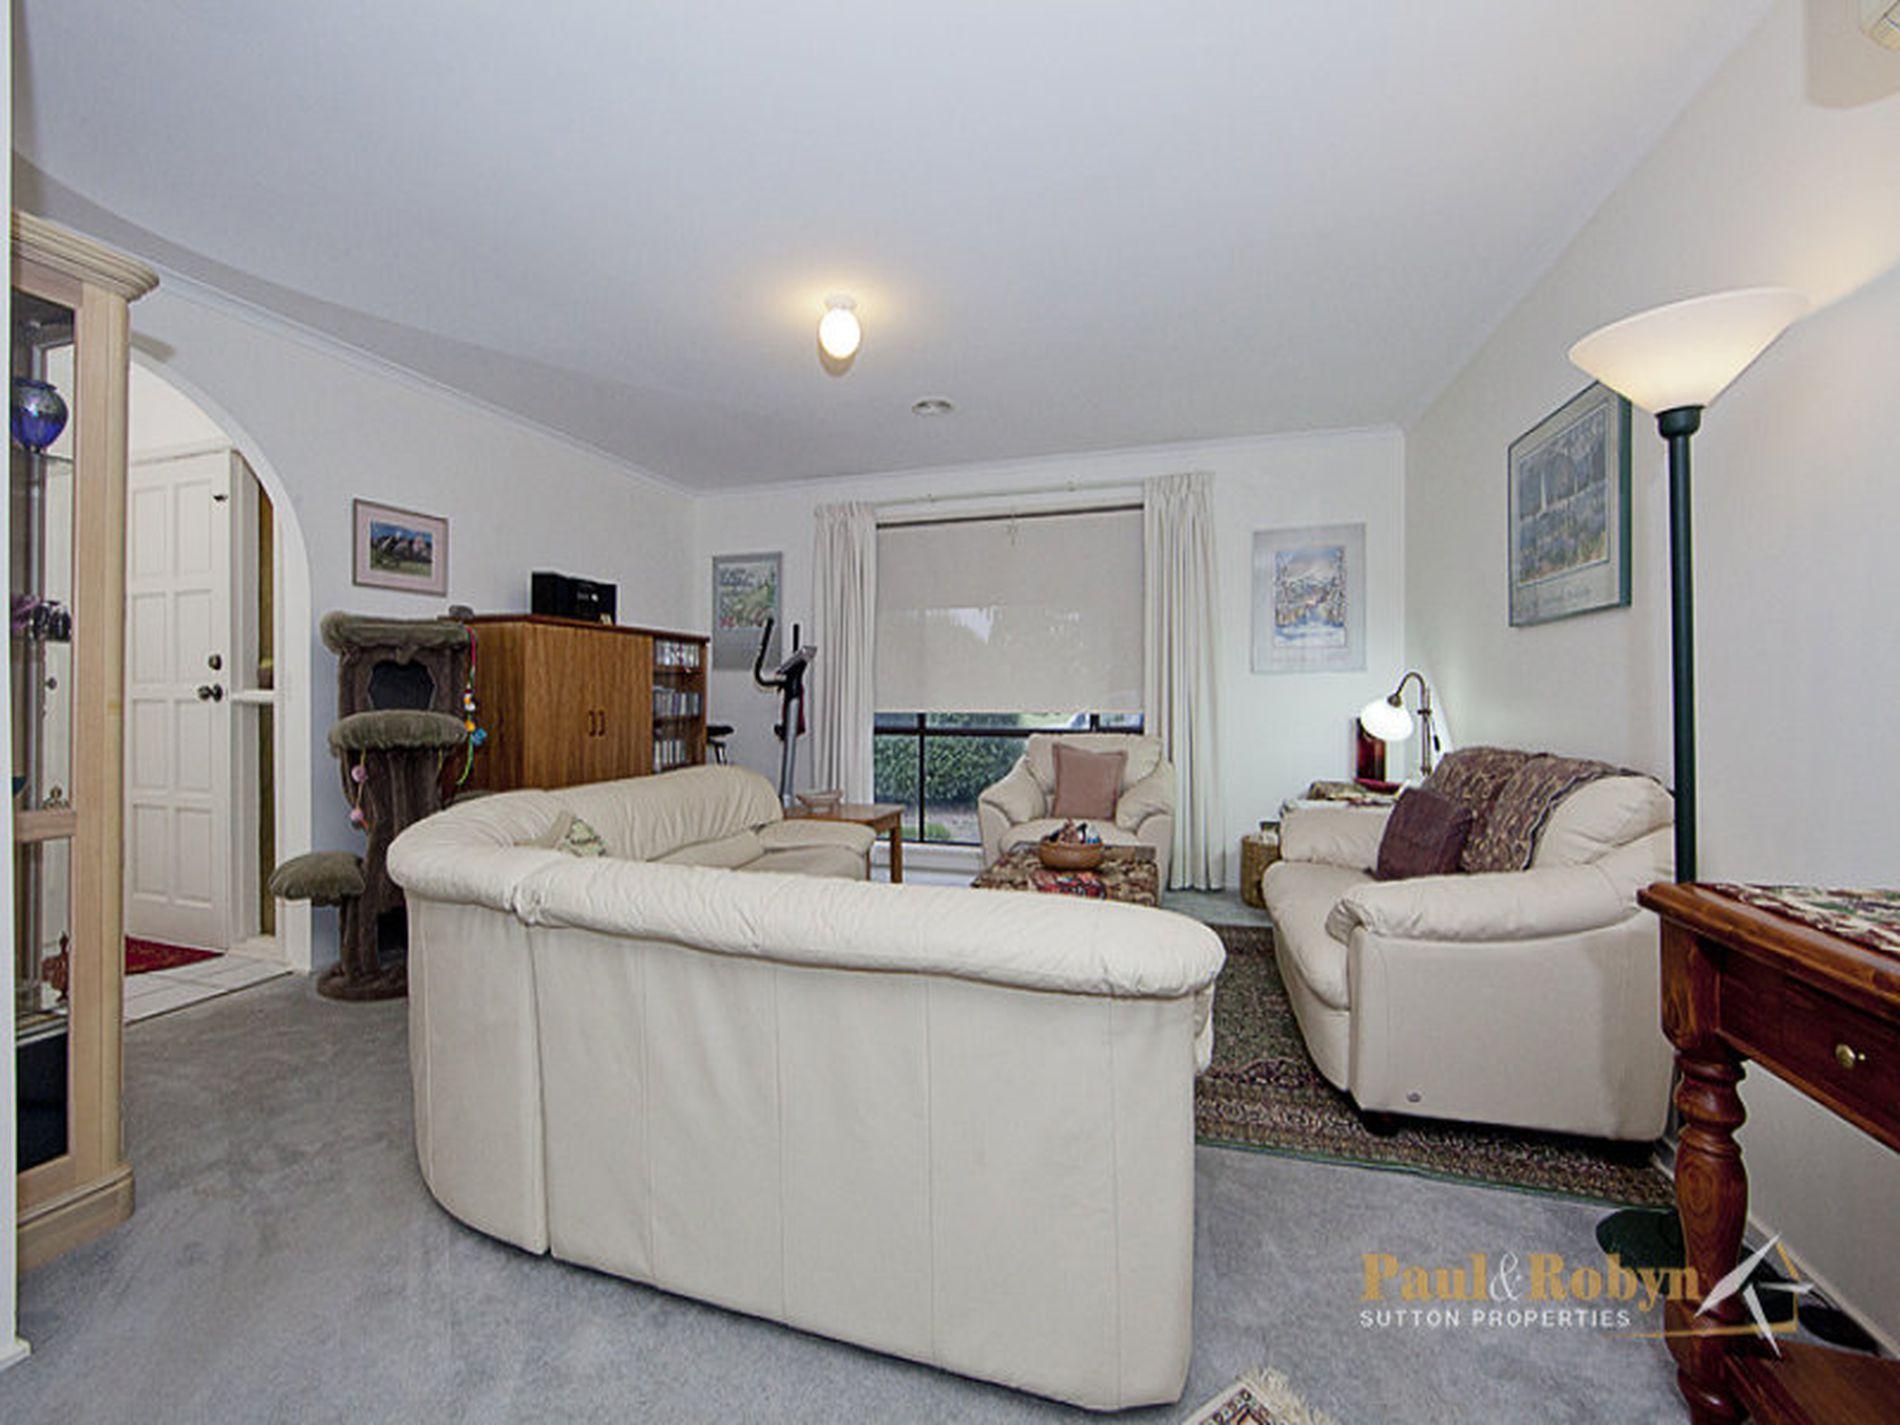 127 Hambidge Crescent, Chisholm